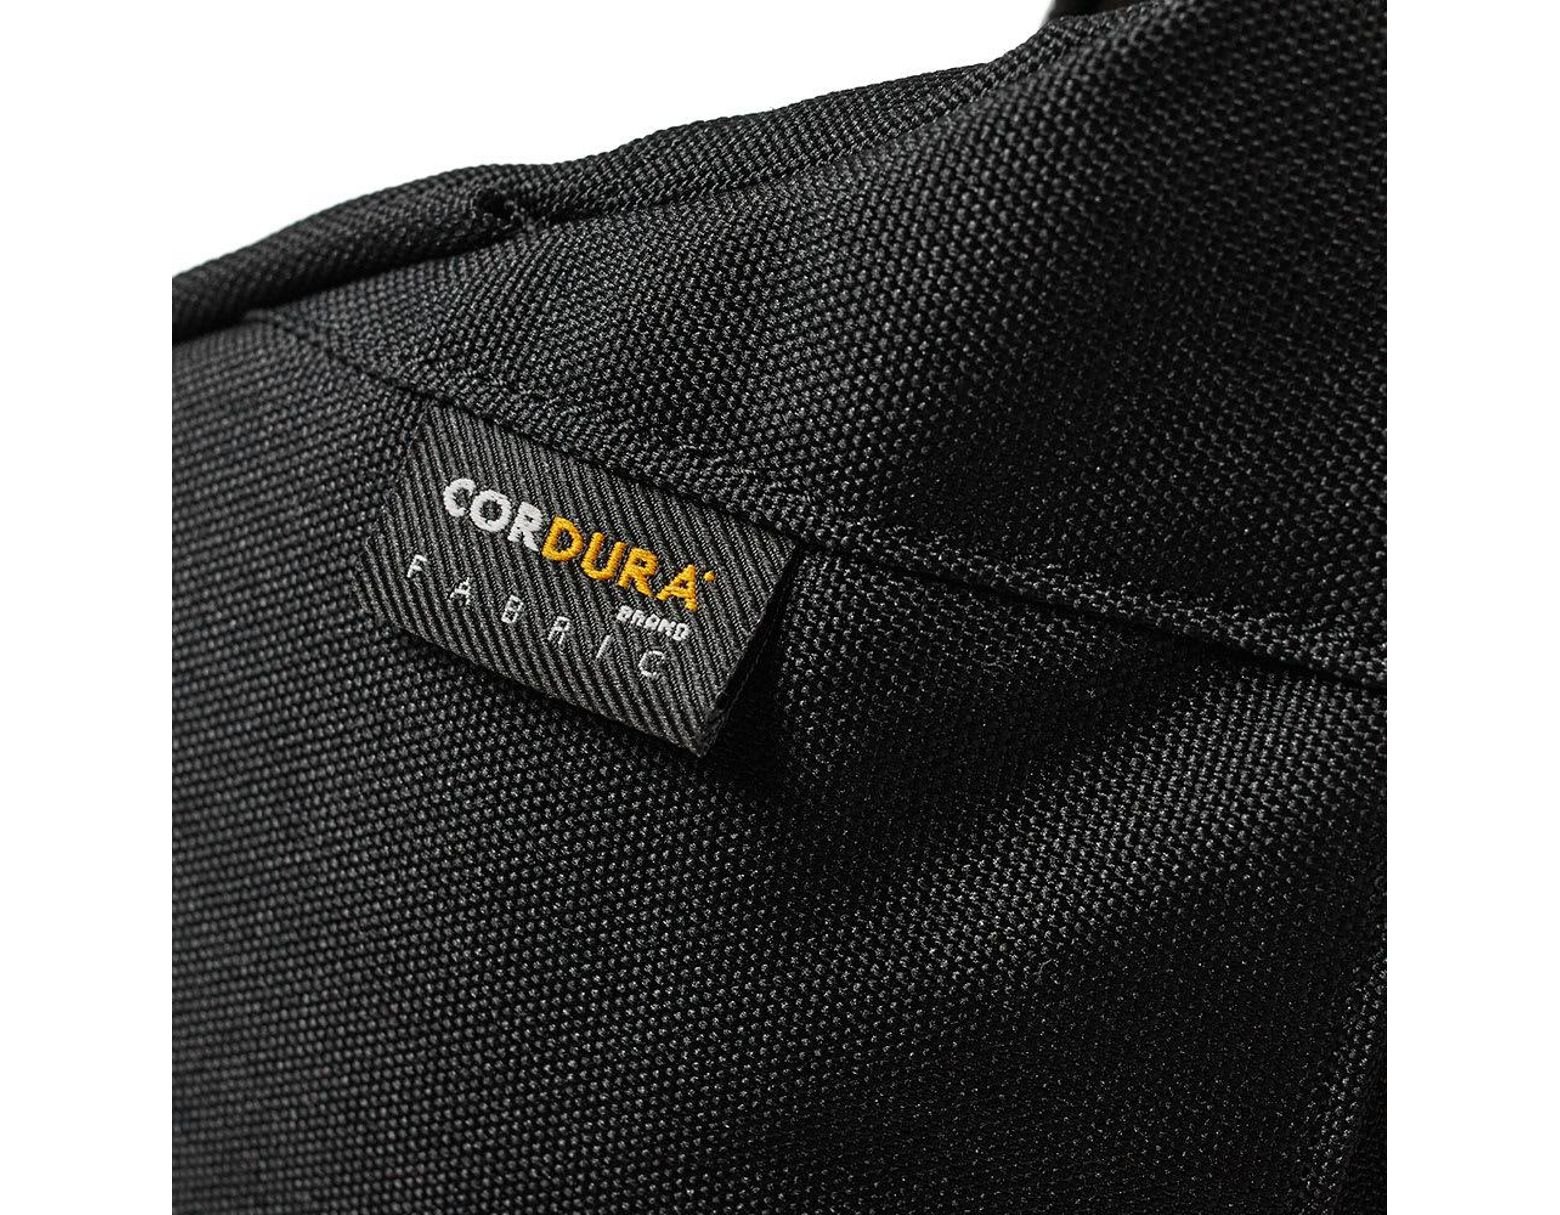 b8a32eb25c5b56 Carhartt WIP Carhartt Payton Hip Bag in Black for Men - Lyst